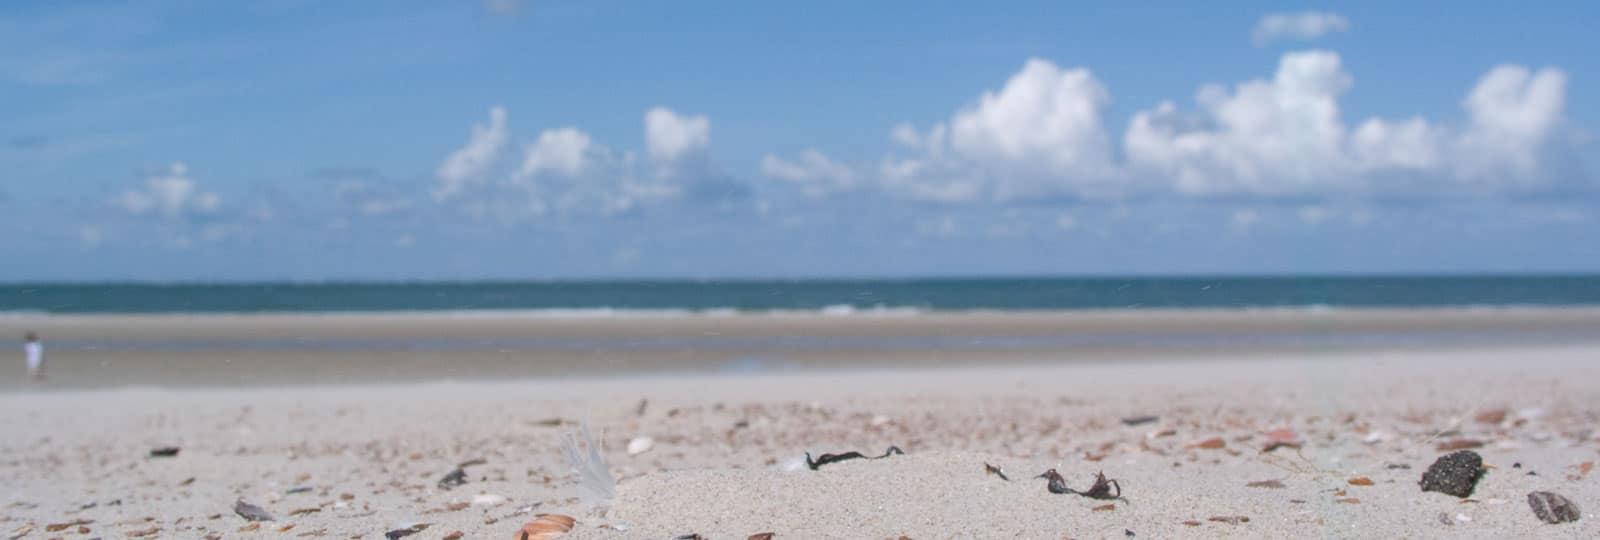 Strand Meer Wolken